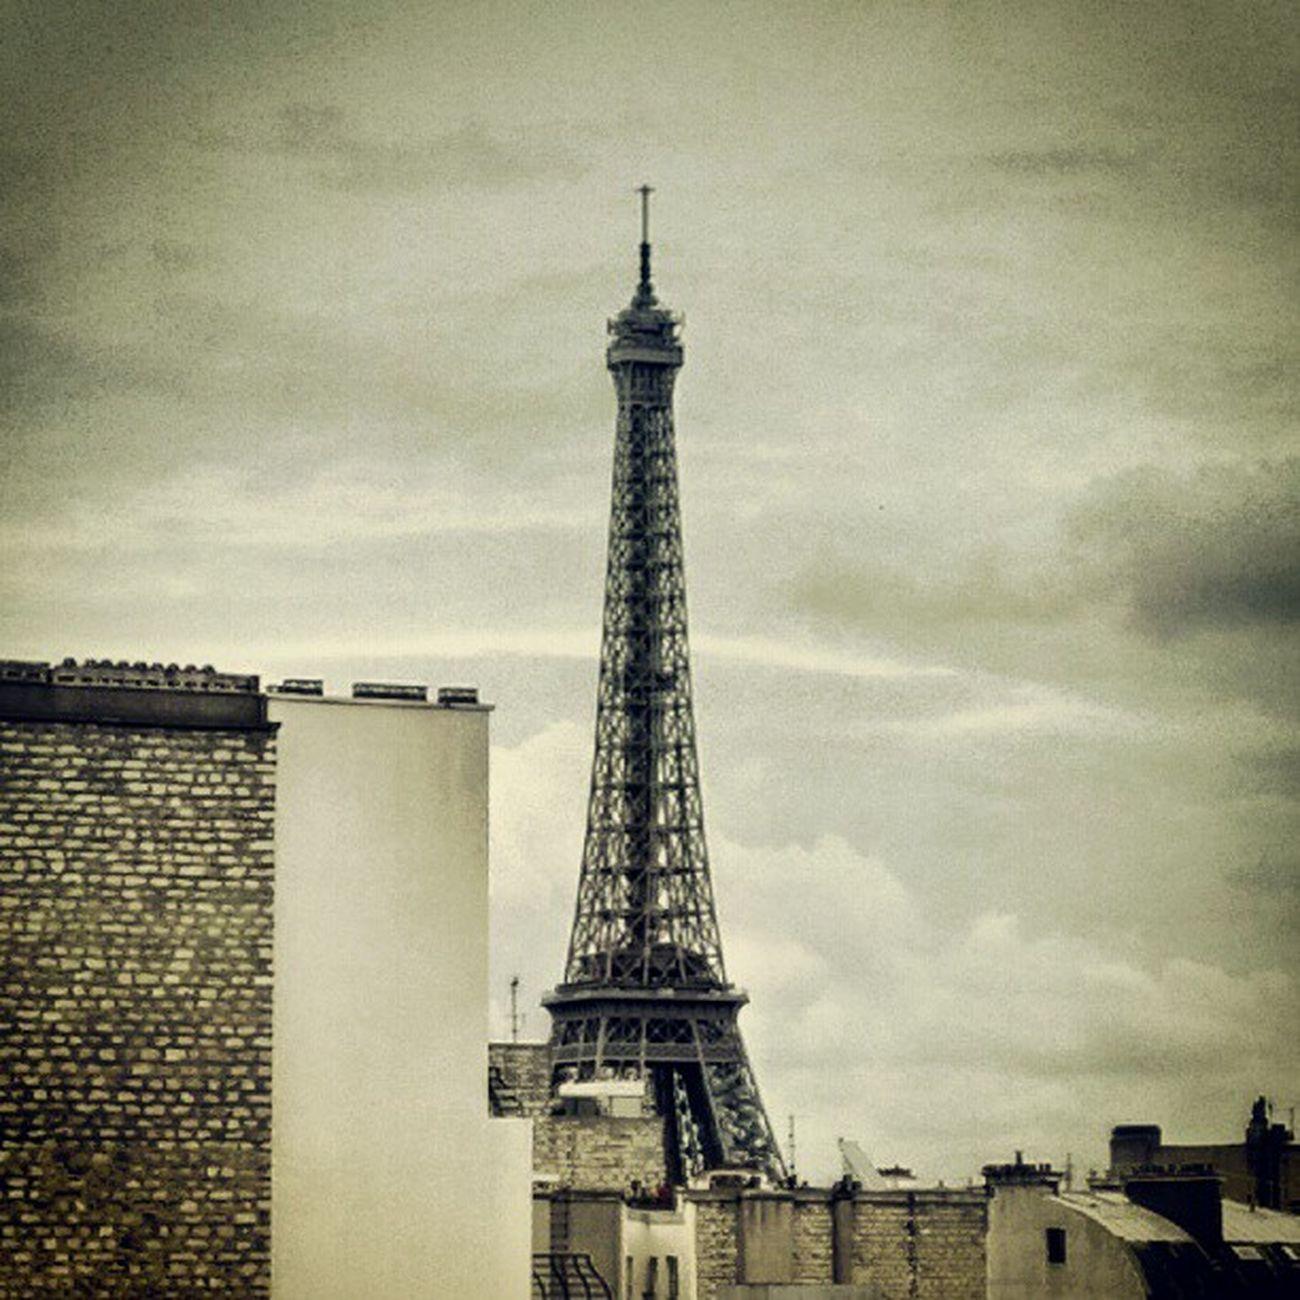 Another day, another view. #ParisTweet Paristweet